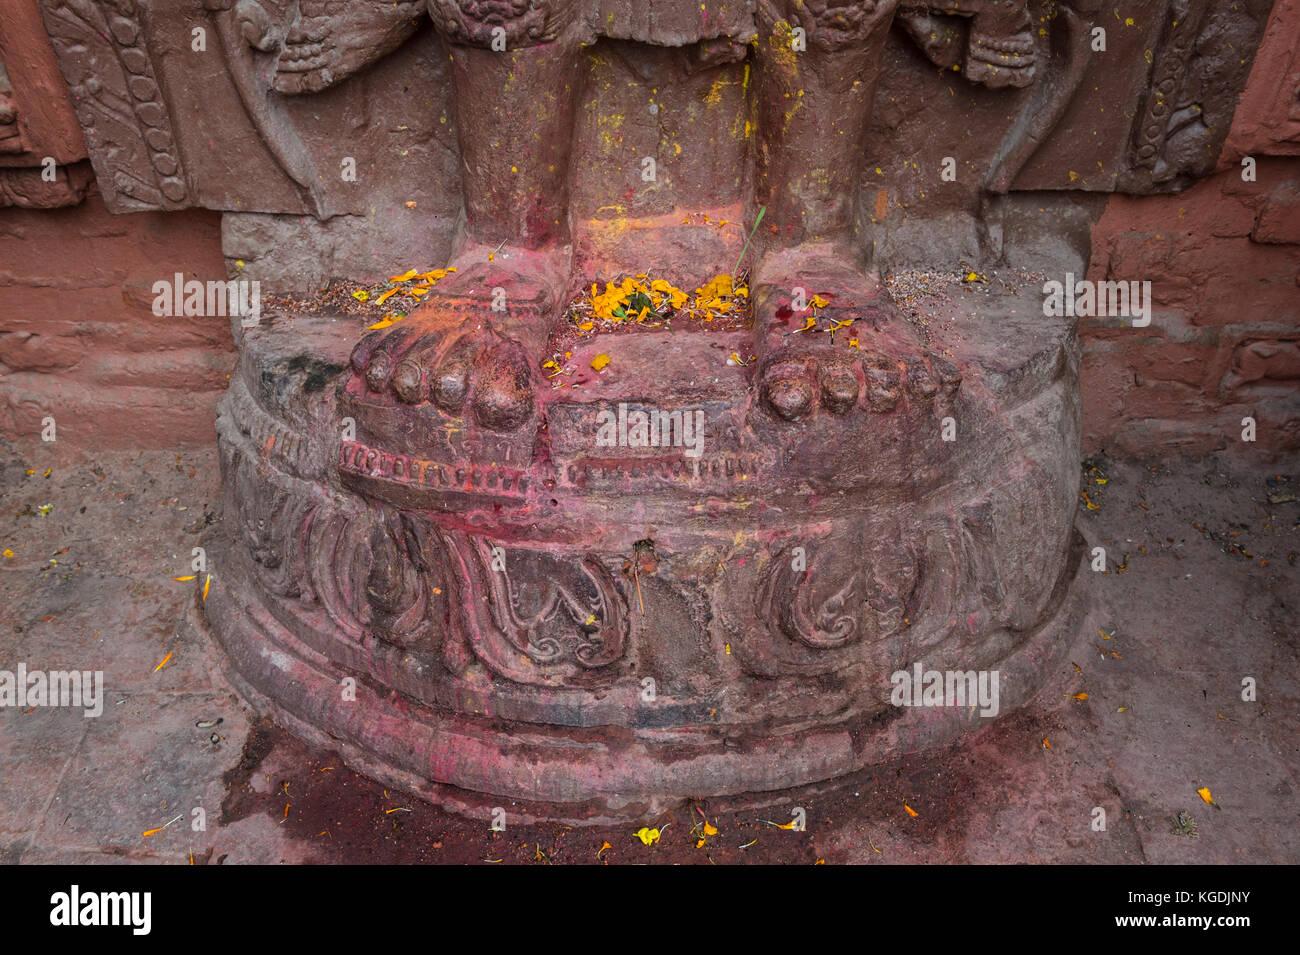 Hinduist statue, Feet Detail, Pashupatinath Temple complex, Unesco World Heritage Site, Kathmandu, Nepal - Stock Image